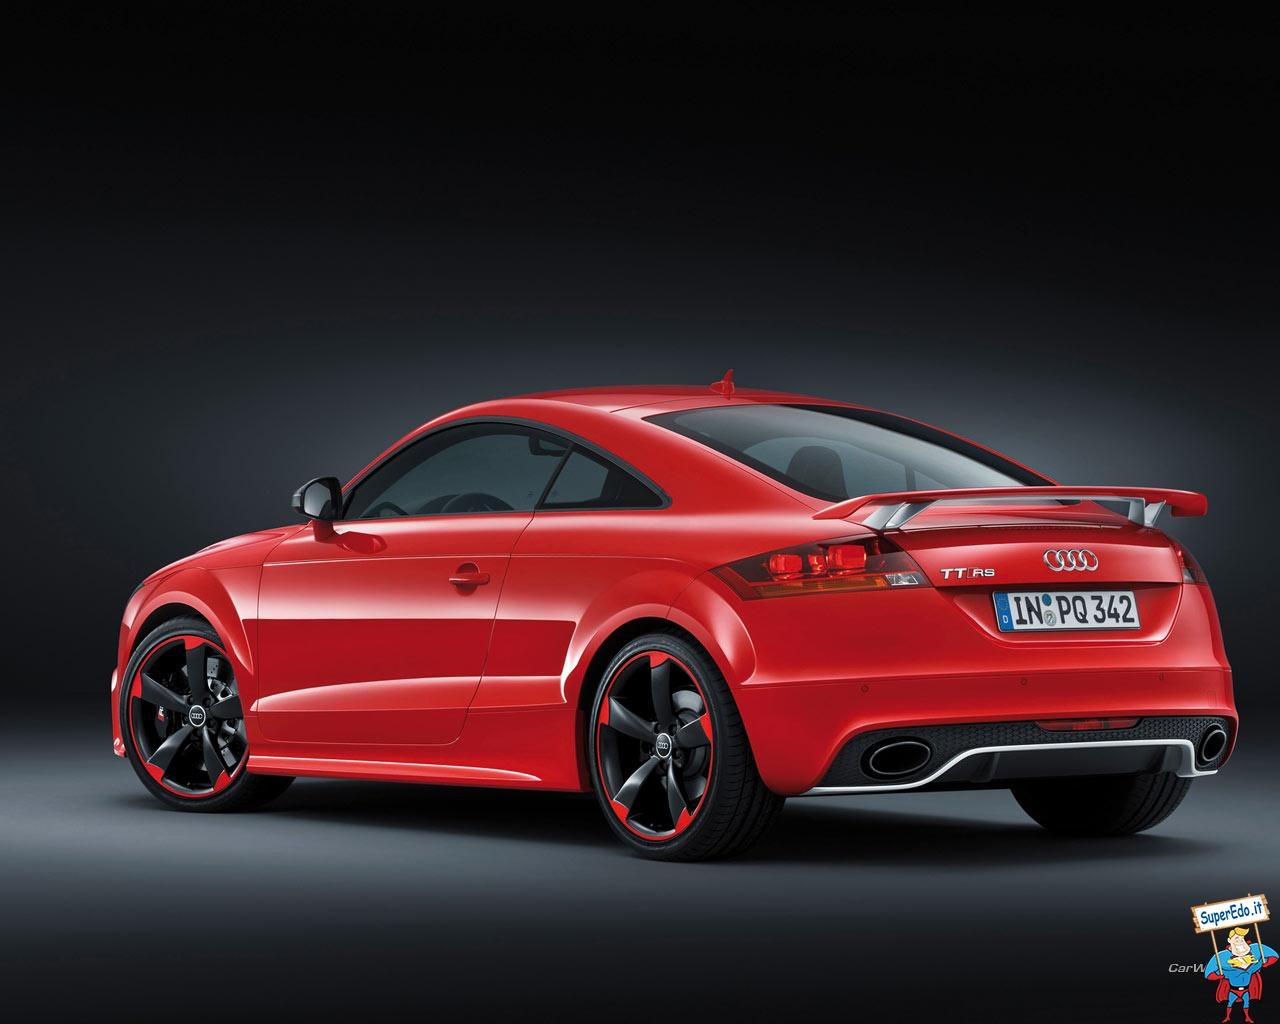 Wallpapers Luxury Car Audi Tt Rs Wallpapers New Audi